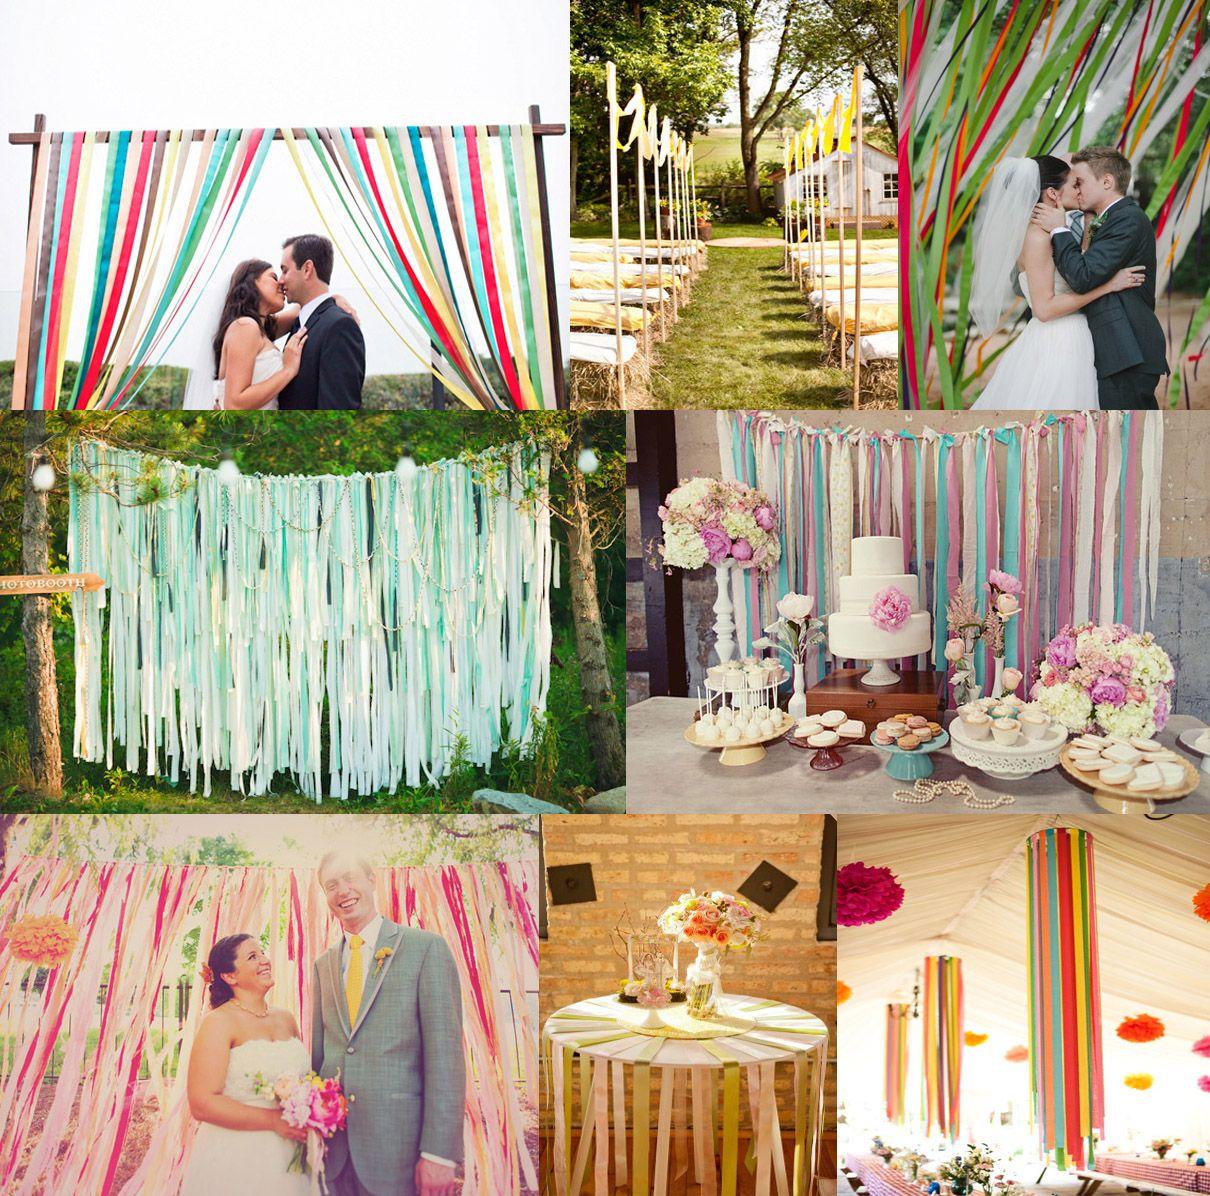 Beautiful wedding ceremony decorations ribbon wedding ideas beautiful wedding ceremony decorations ribbon wedding ideas simply peachy wedding blog junglespirit Choice Image